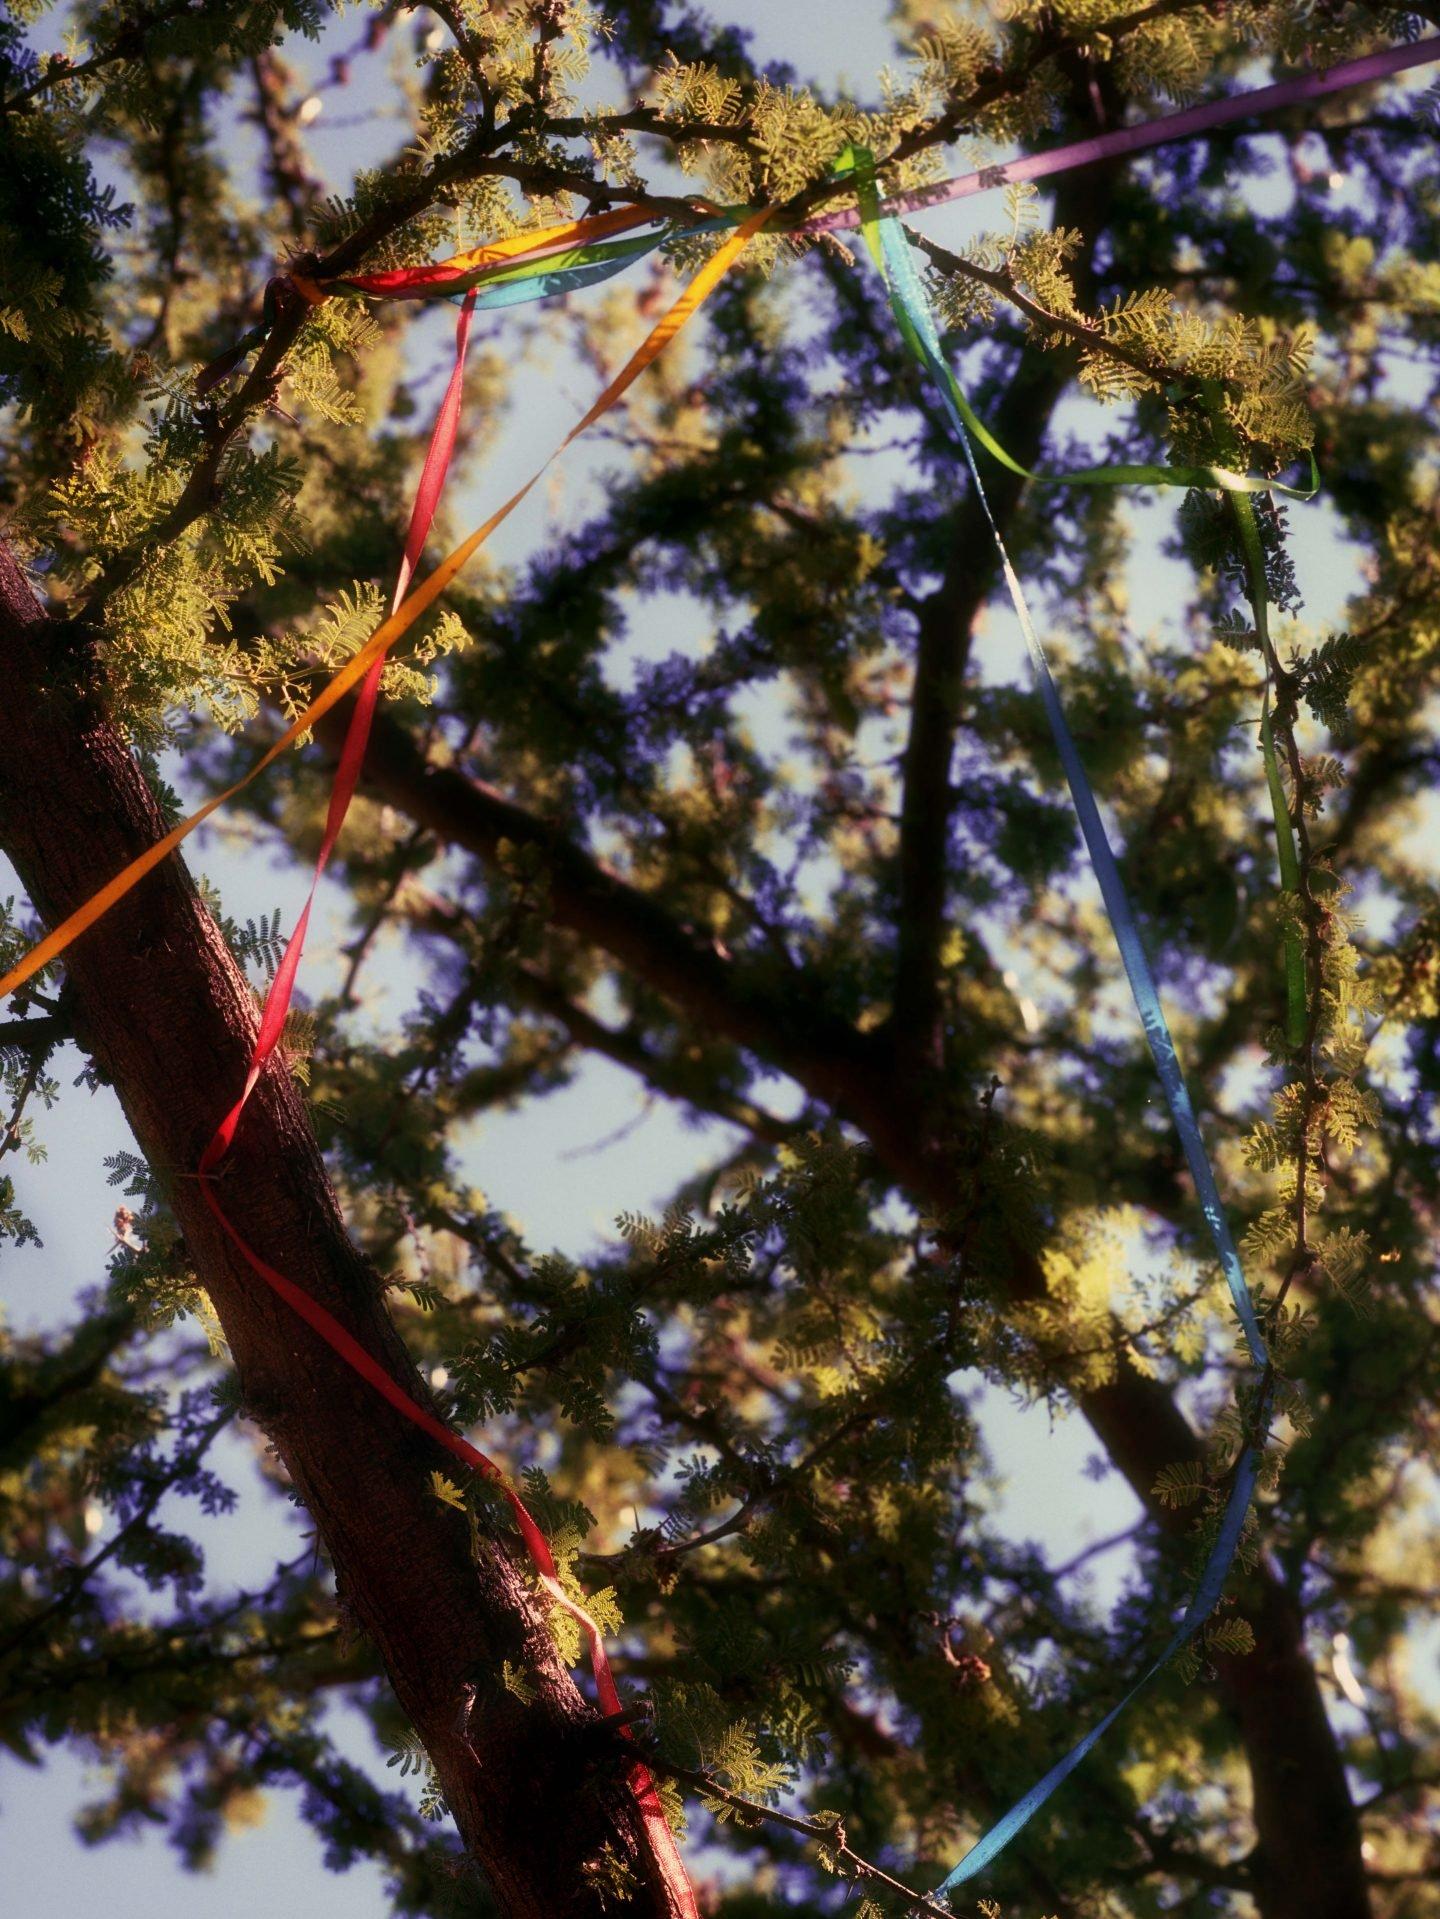 IGNANT-Photography-Jacques-Brun-Sunset-Garden-012